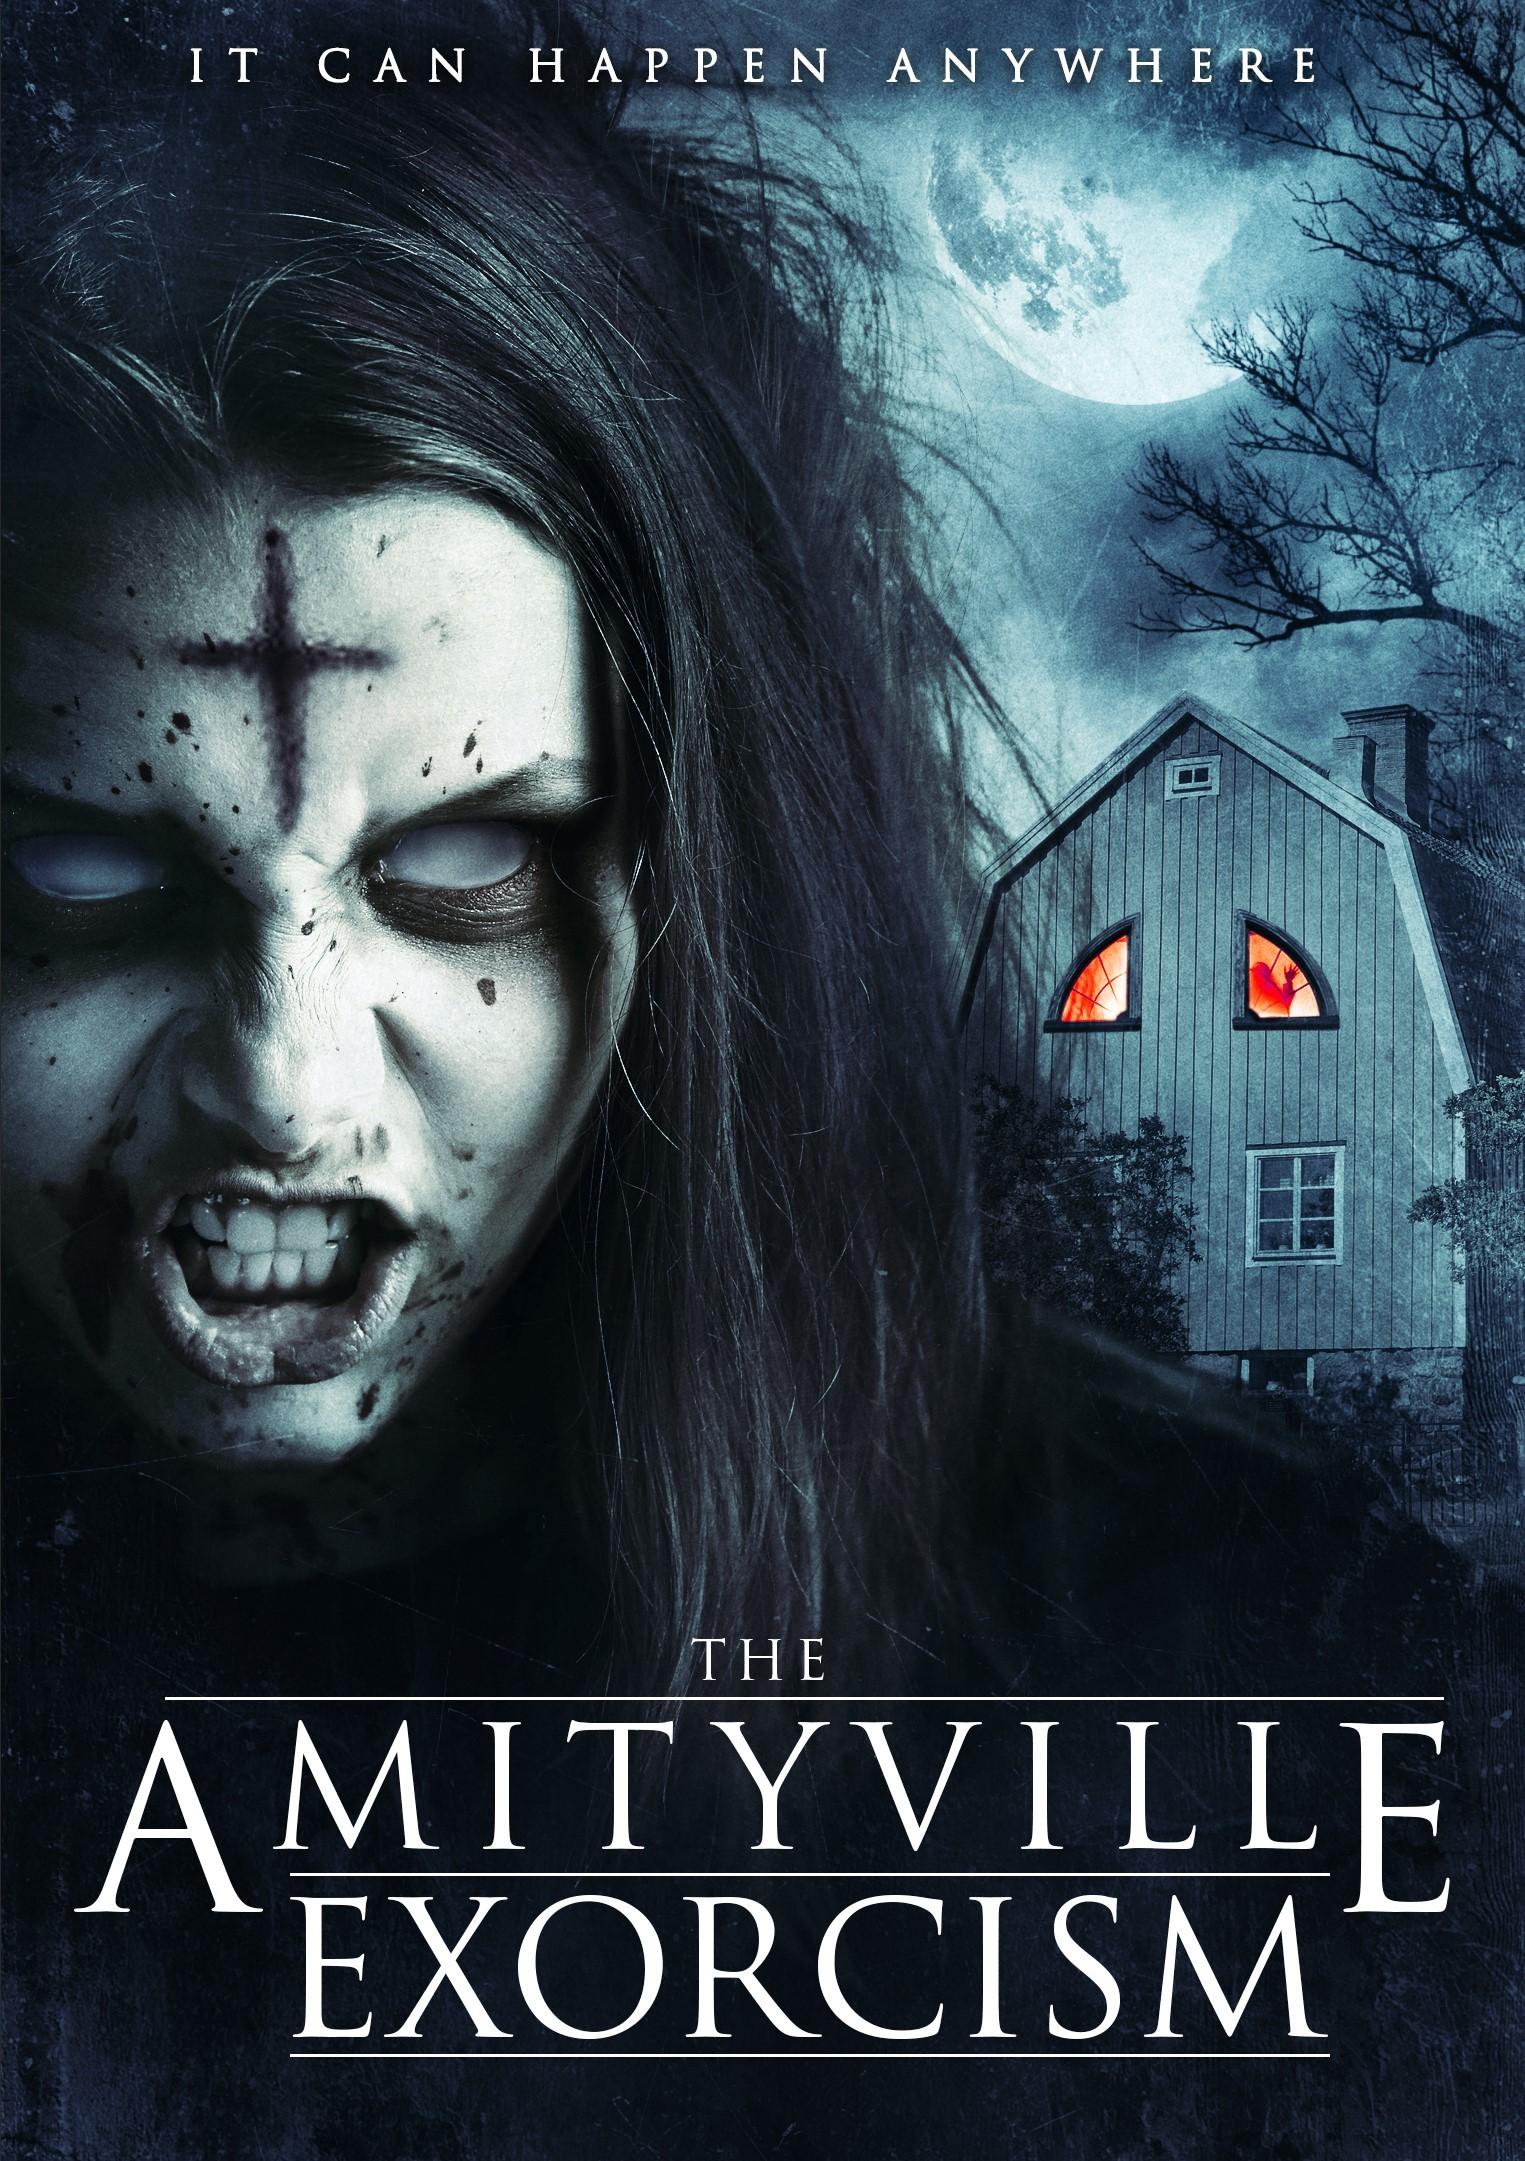 Amityville_Exorcism_Revised_Key_Art.jpg?1565018653